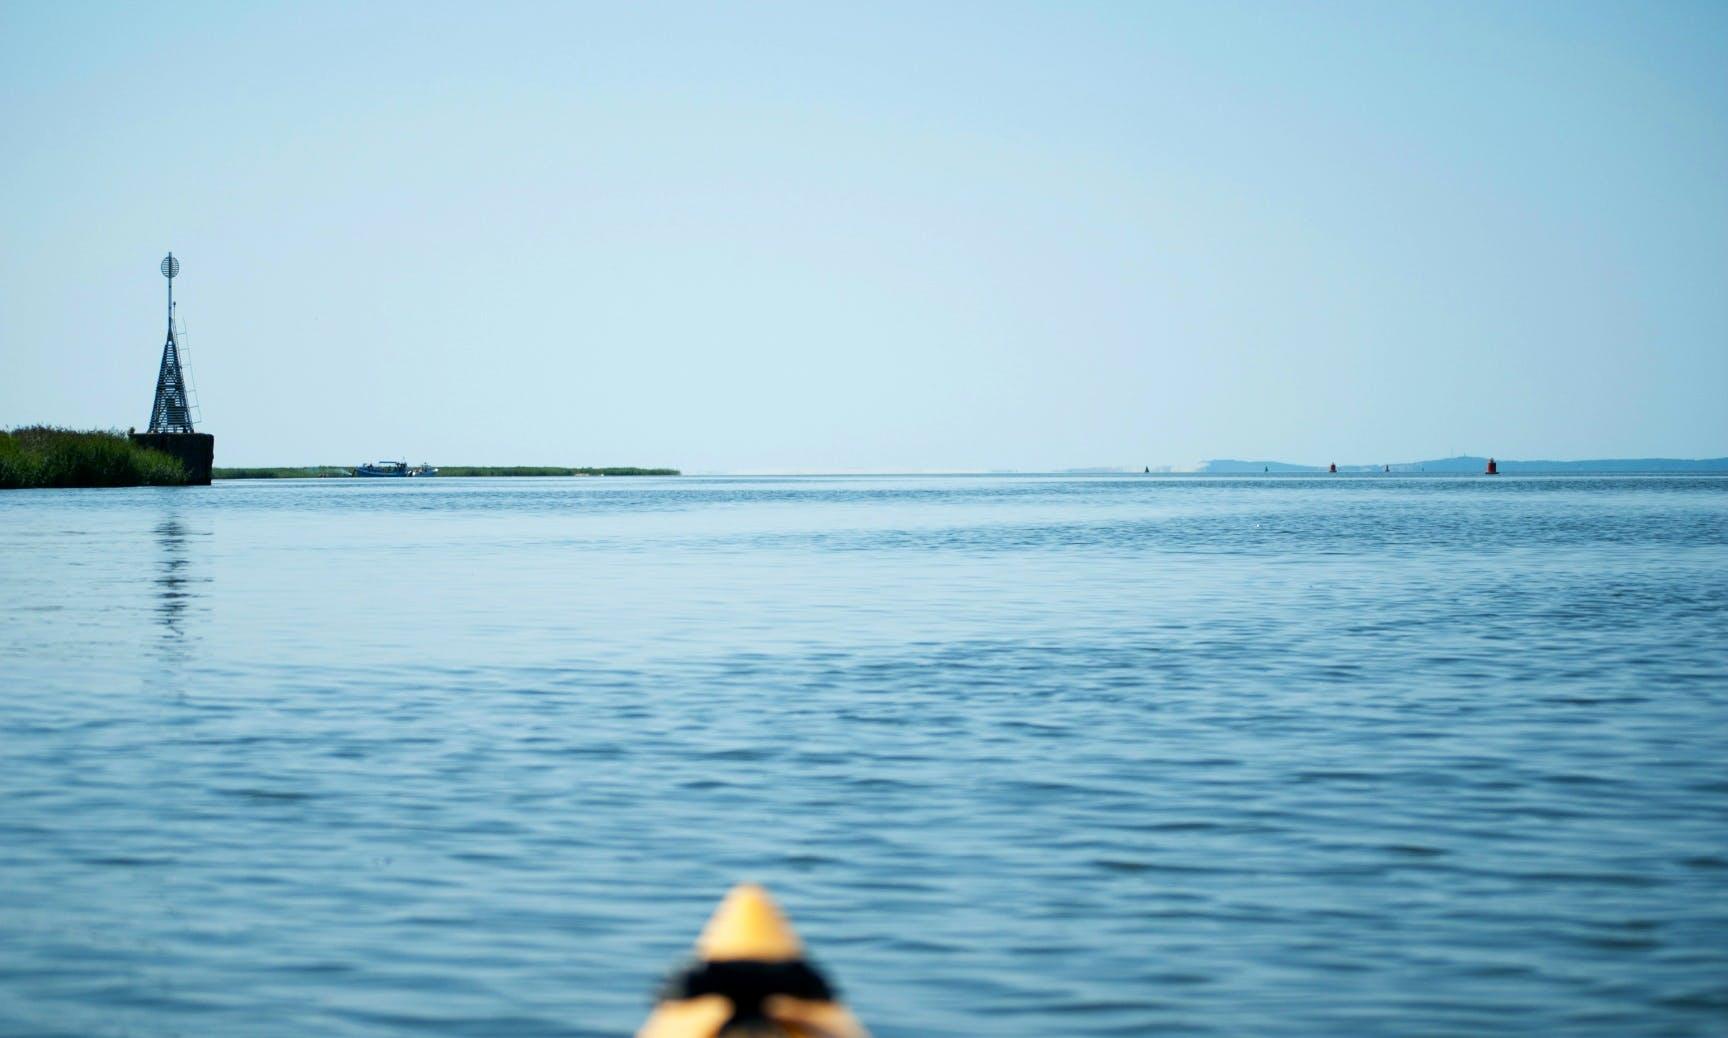 Kayak tour to Nemunas river delta from Klaipeda